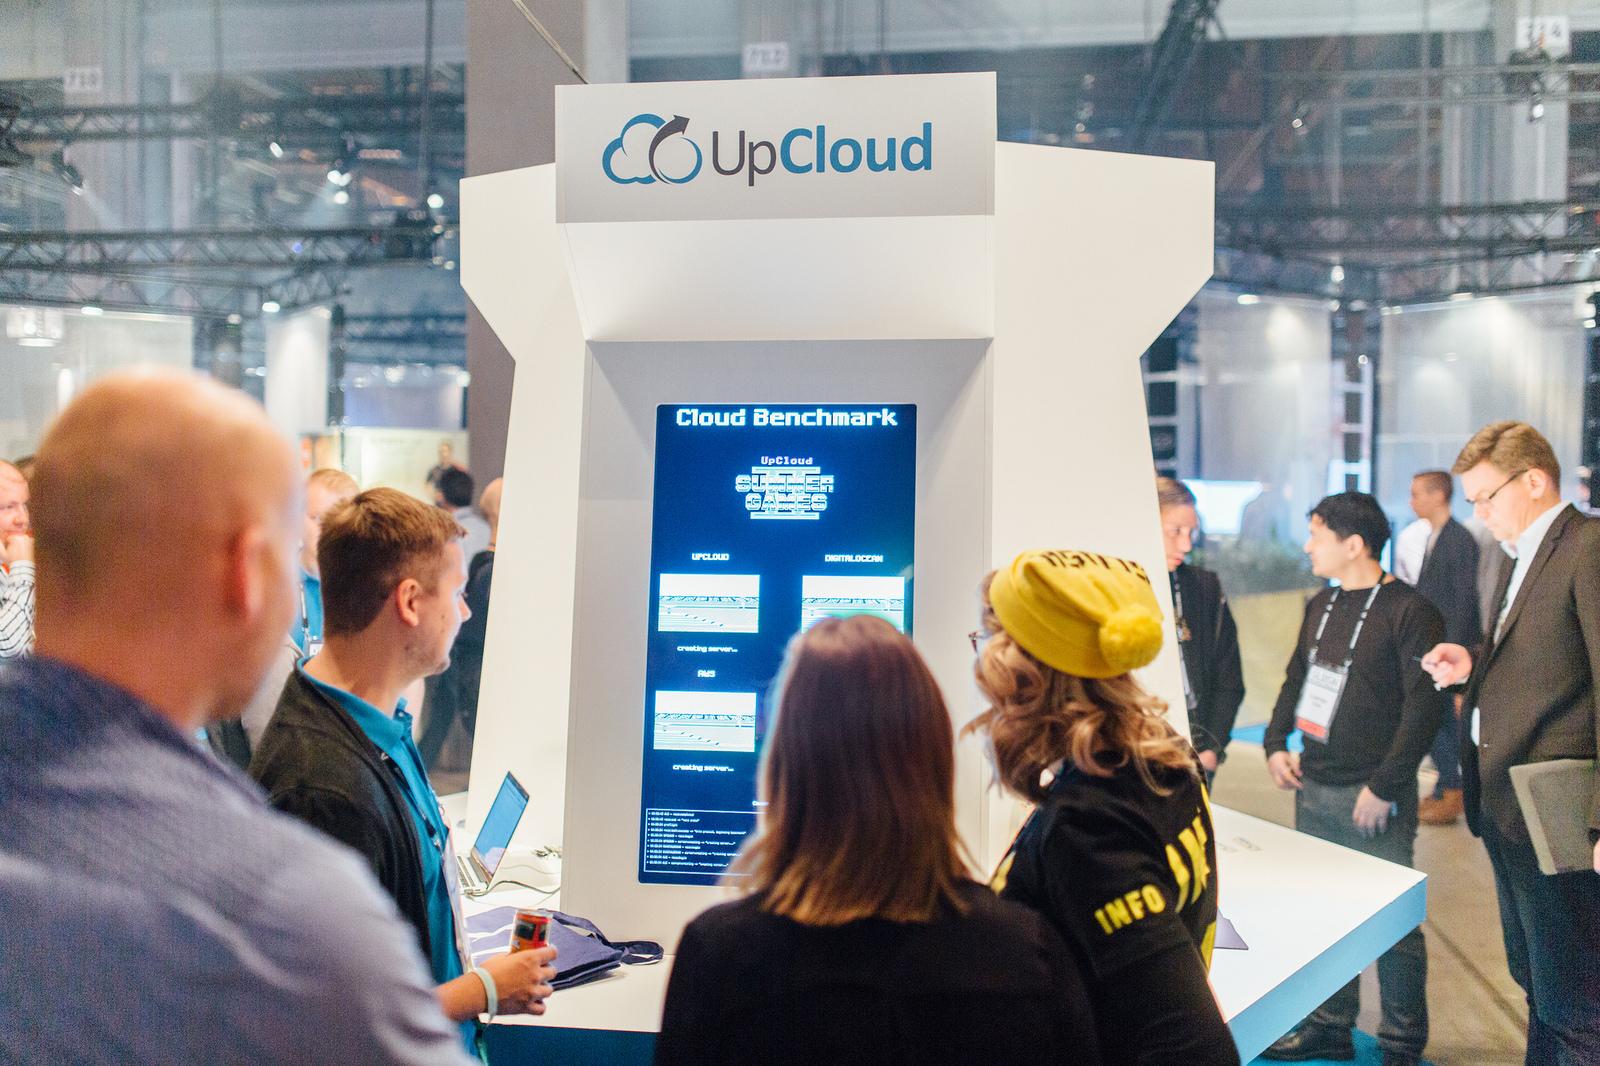 Cloud benchmark Slush Helsinki 2015